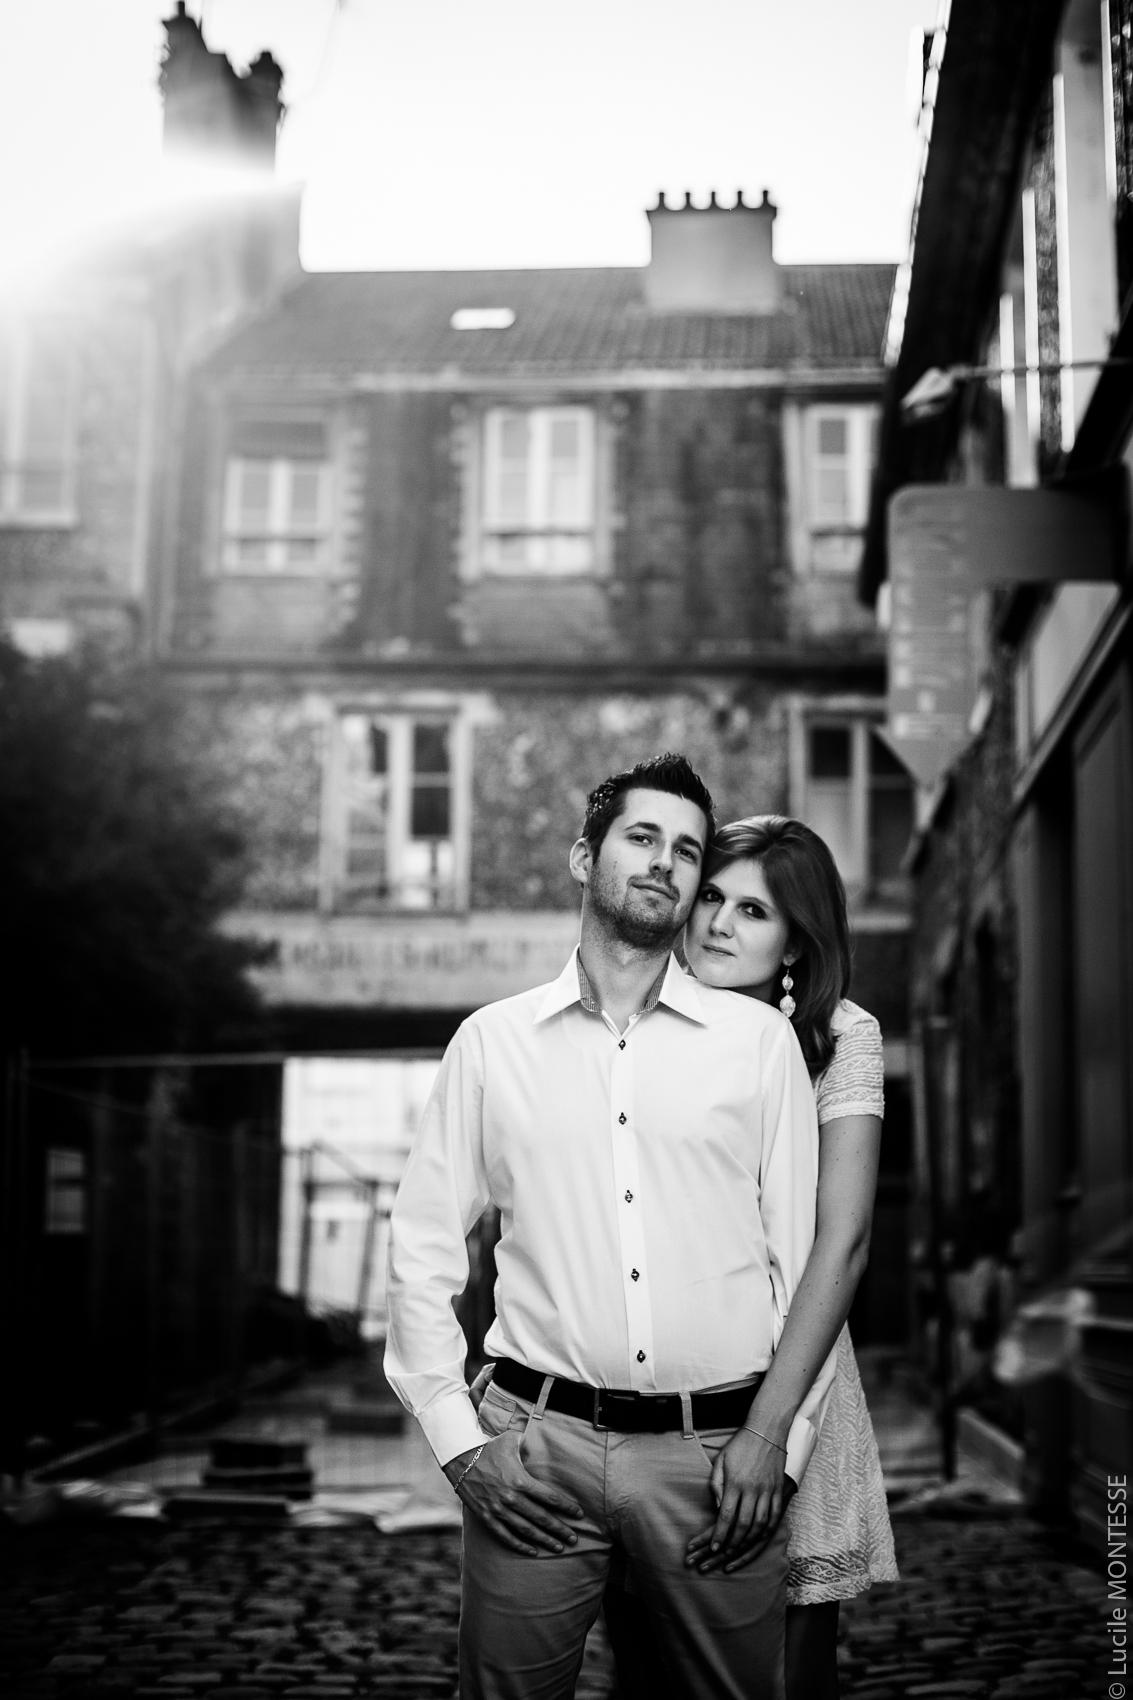 Photographe: Lucile Montesse, http://www.lucilemontesse.com